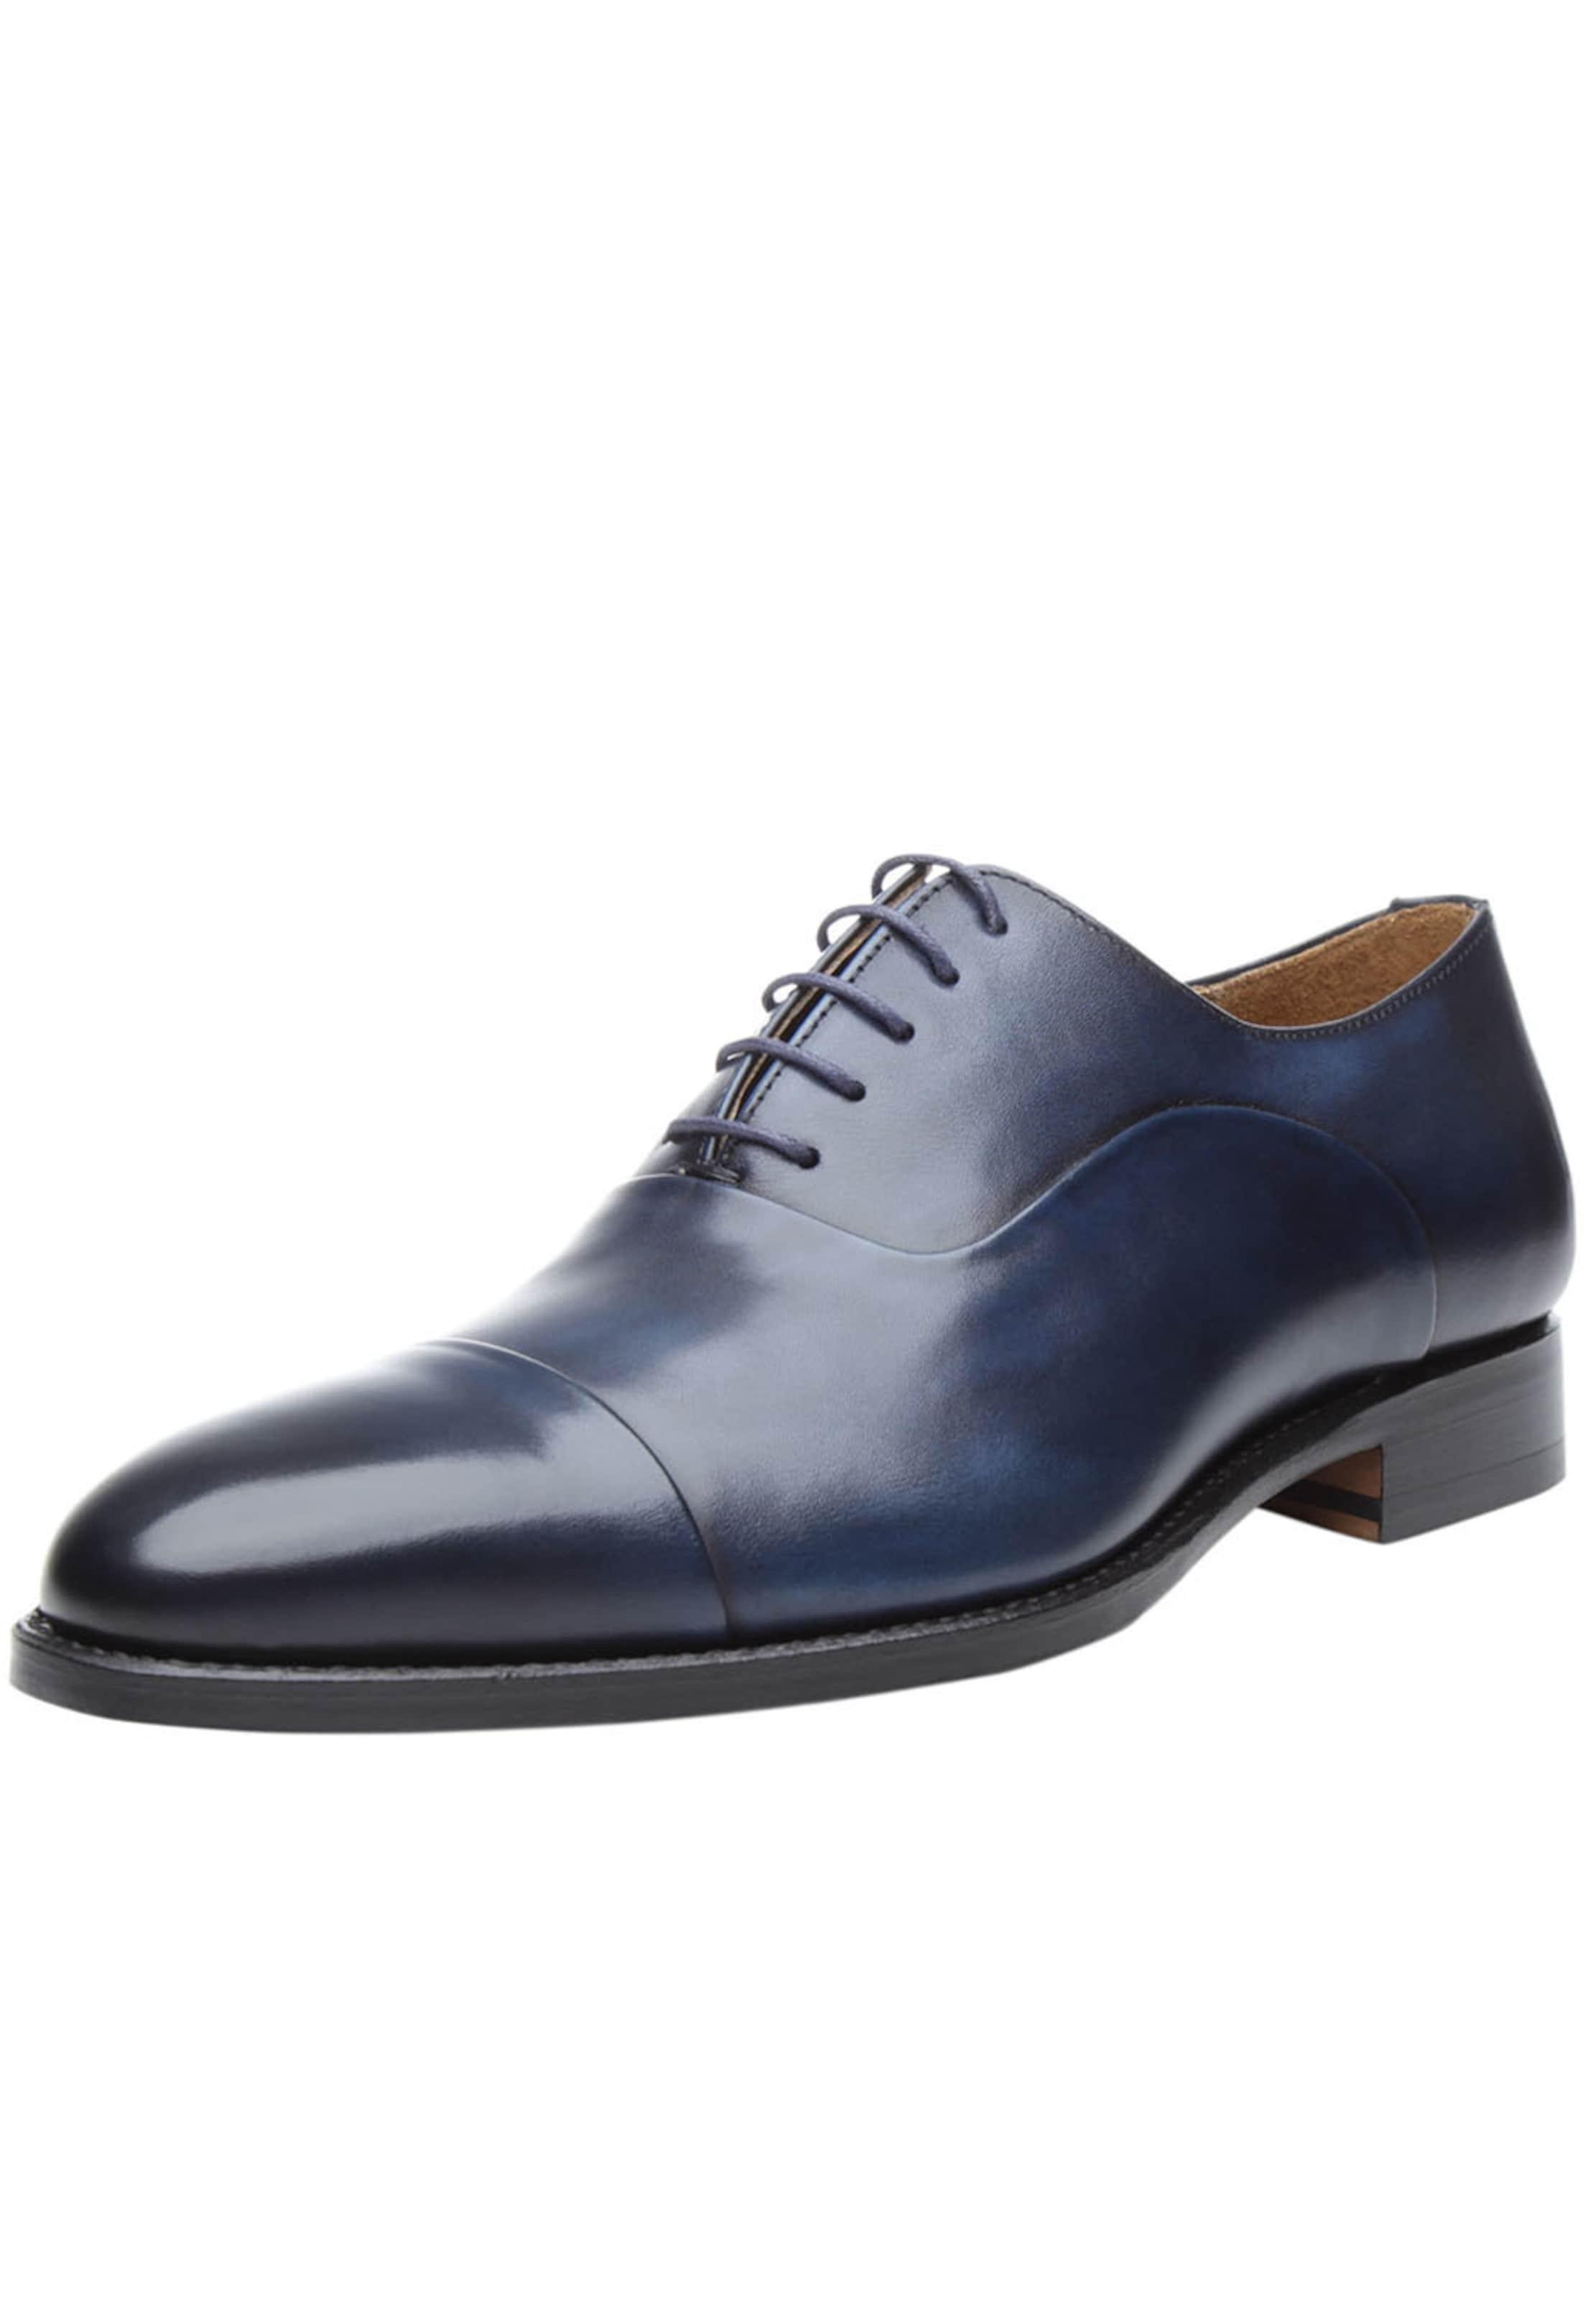 Haltbare Mode billige Schuhe SHOEPASSION | Halbschuhe 'No. Schuhe 5222' Schuhe Gut getragene Schuhe 'No. bcb225